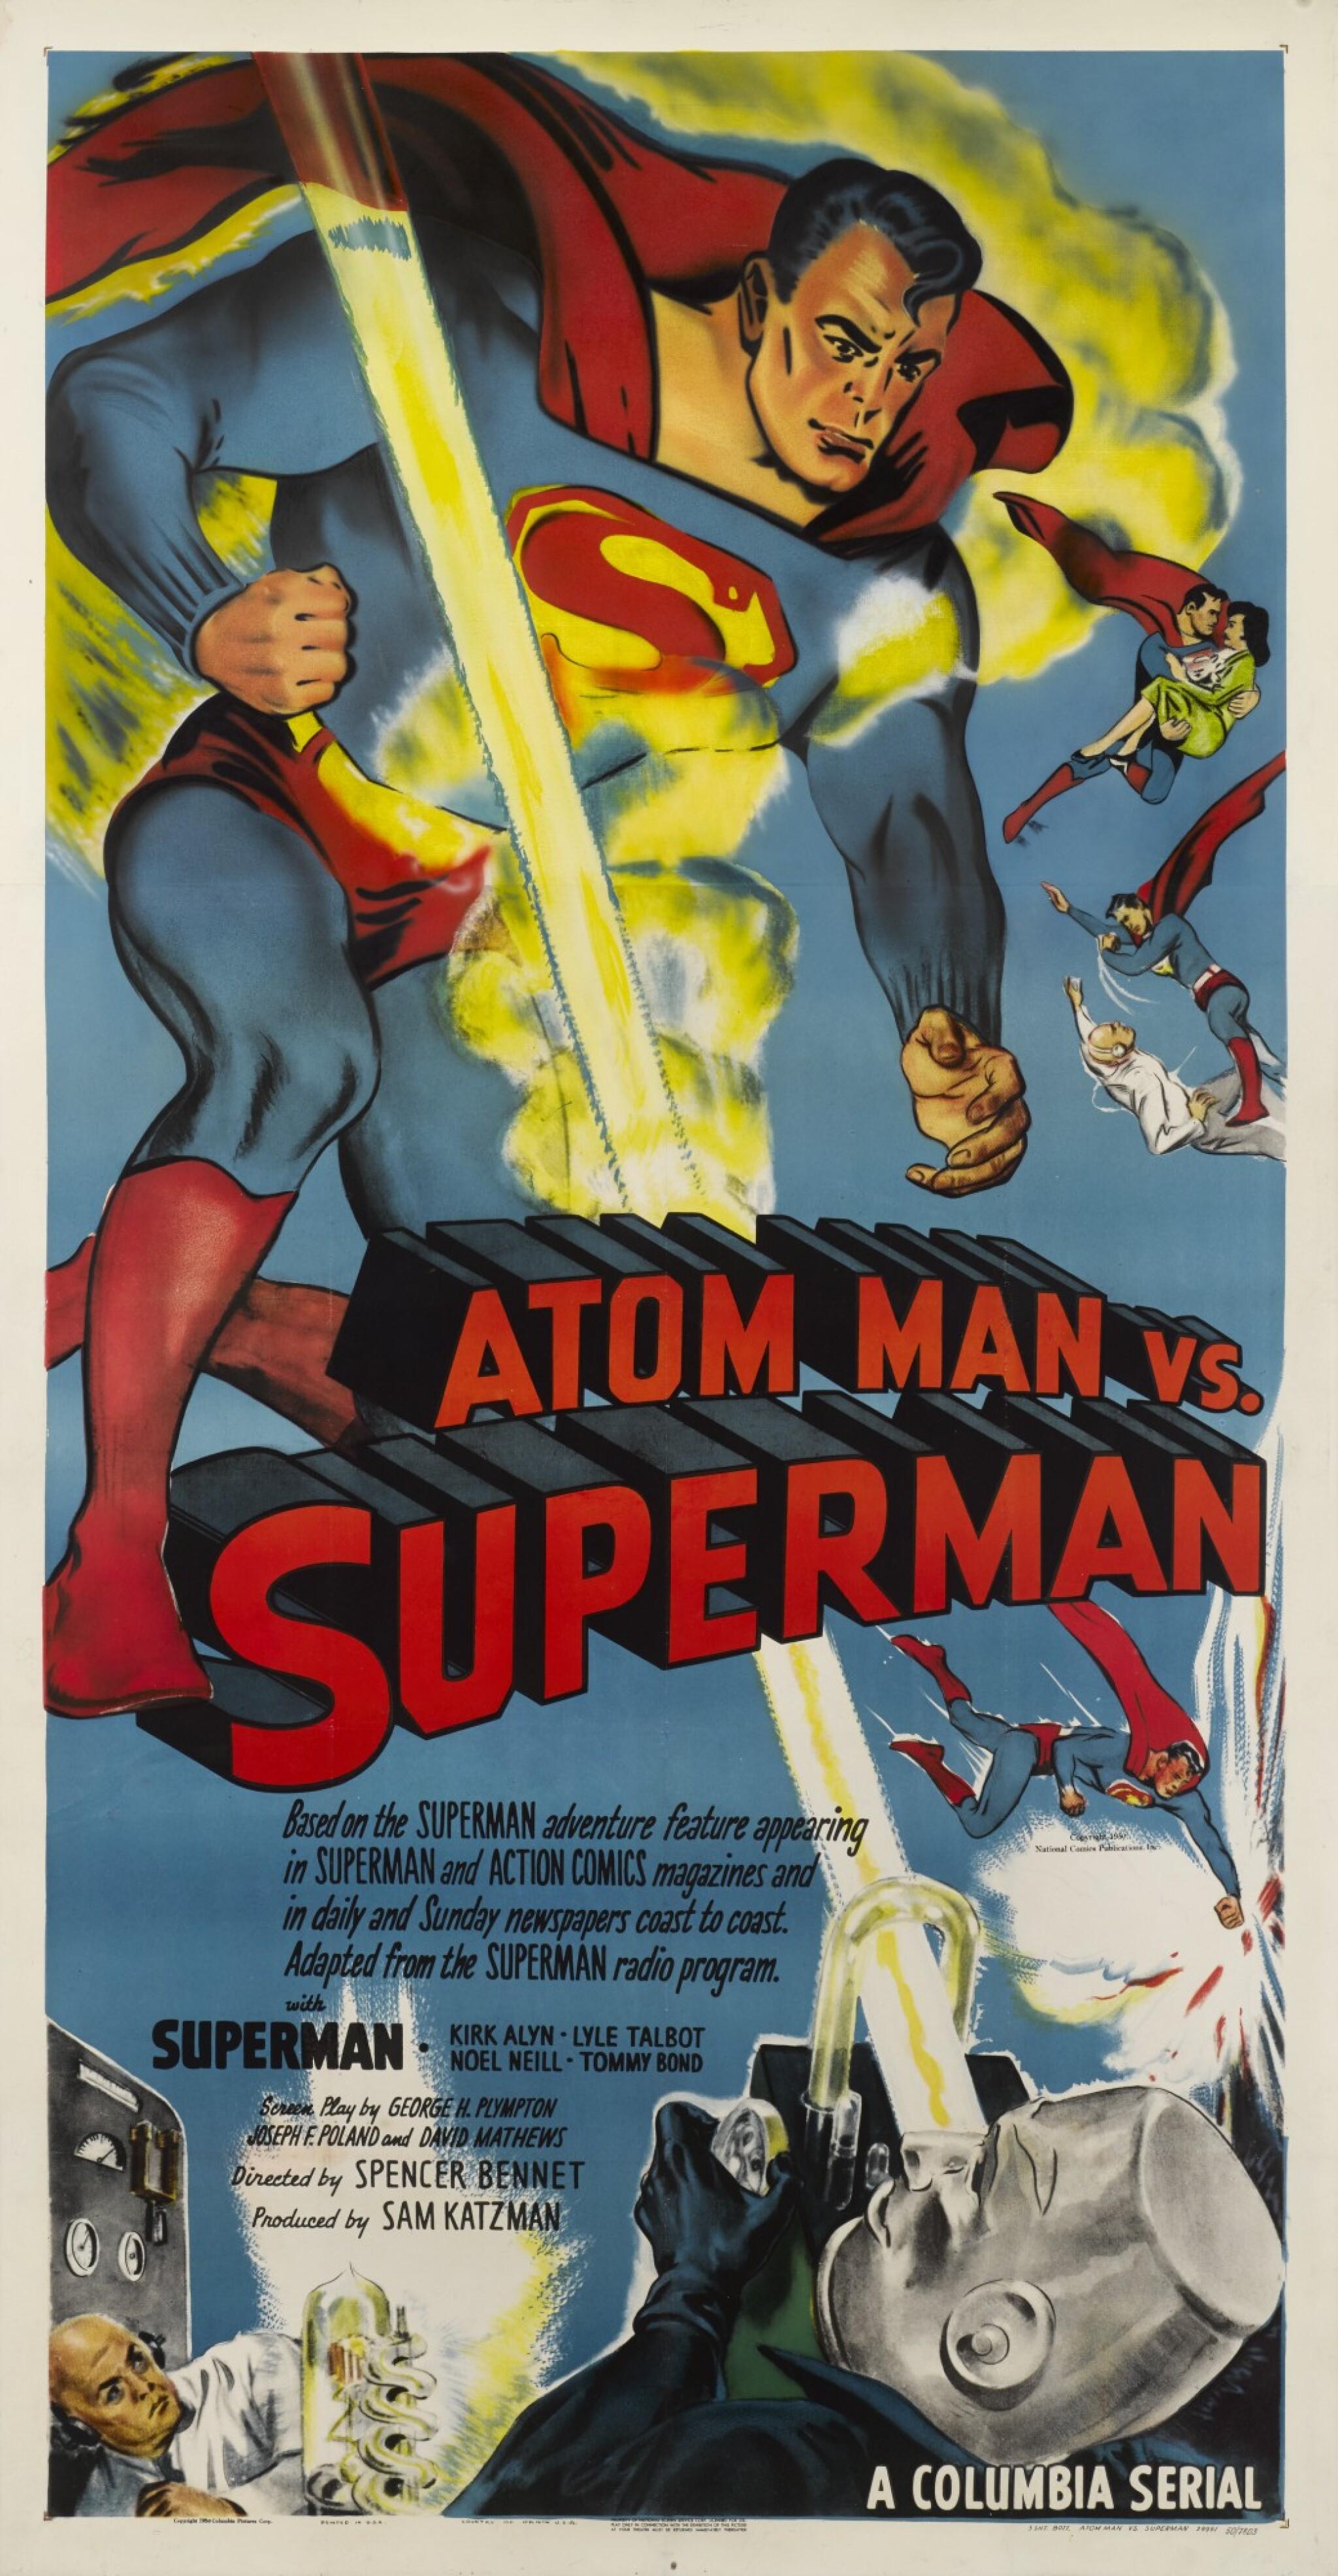 ATOM MAN VS. SUPERMAN (1950) POSTER, US